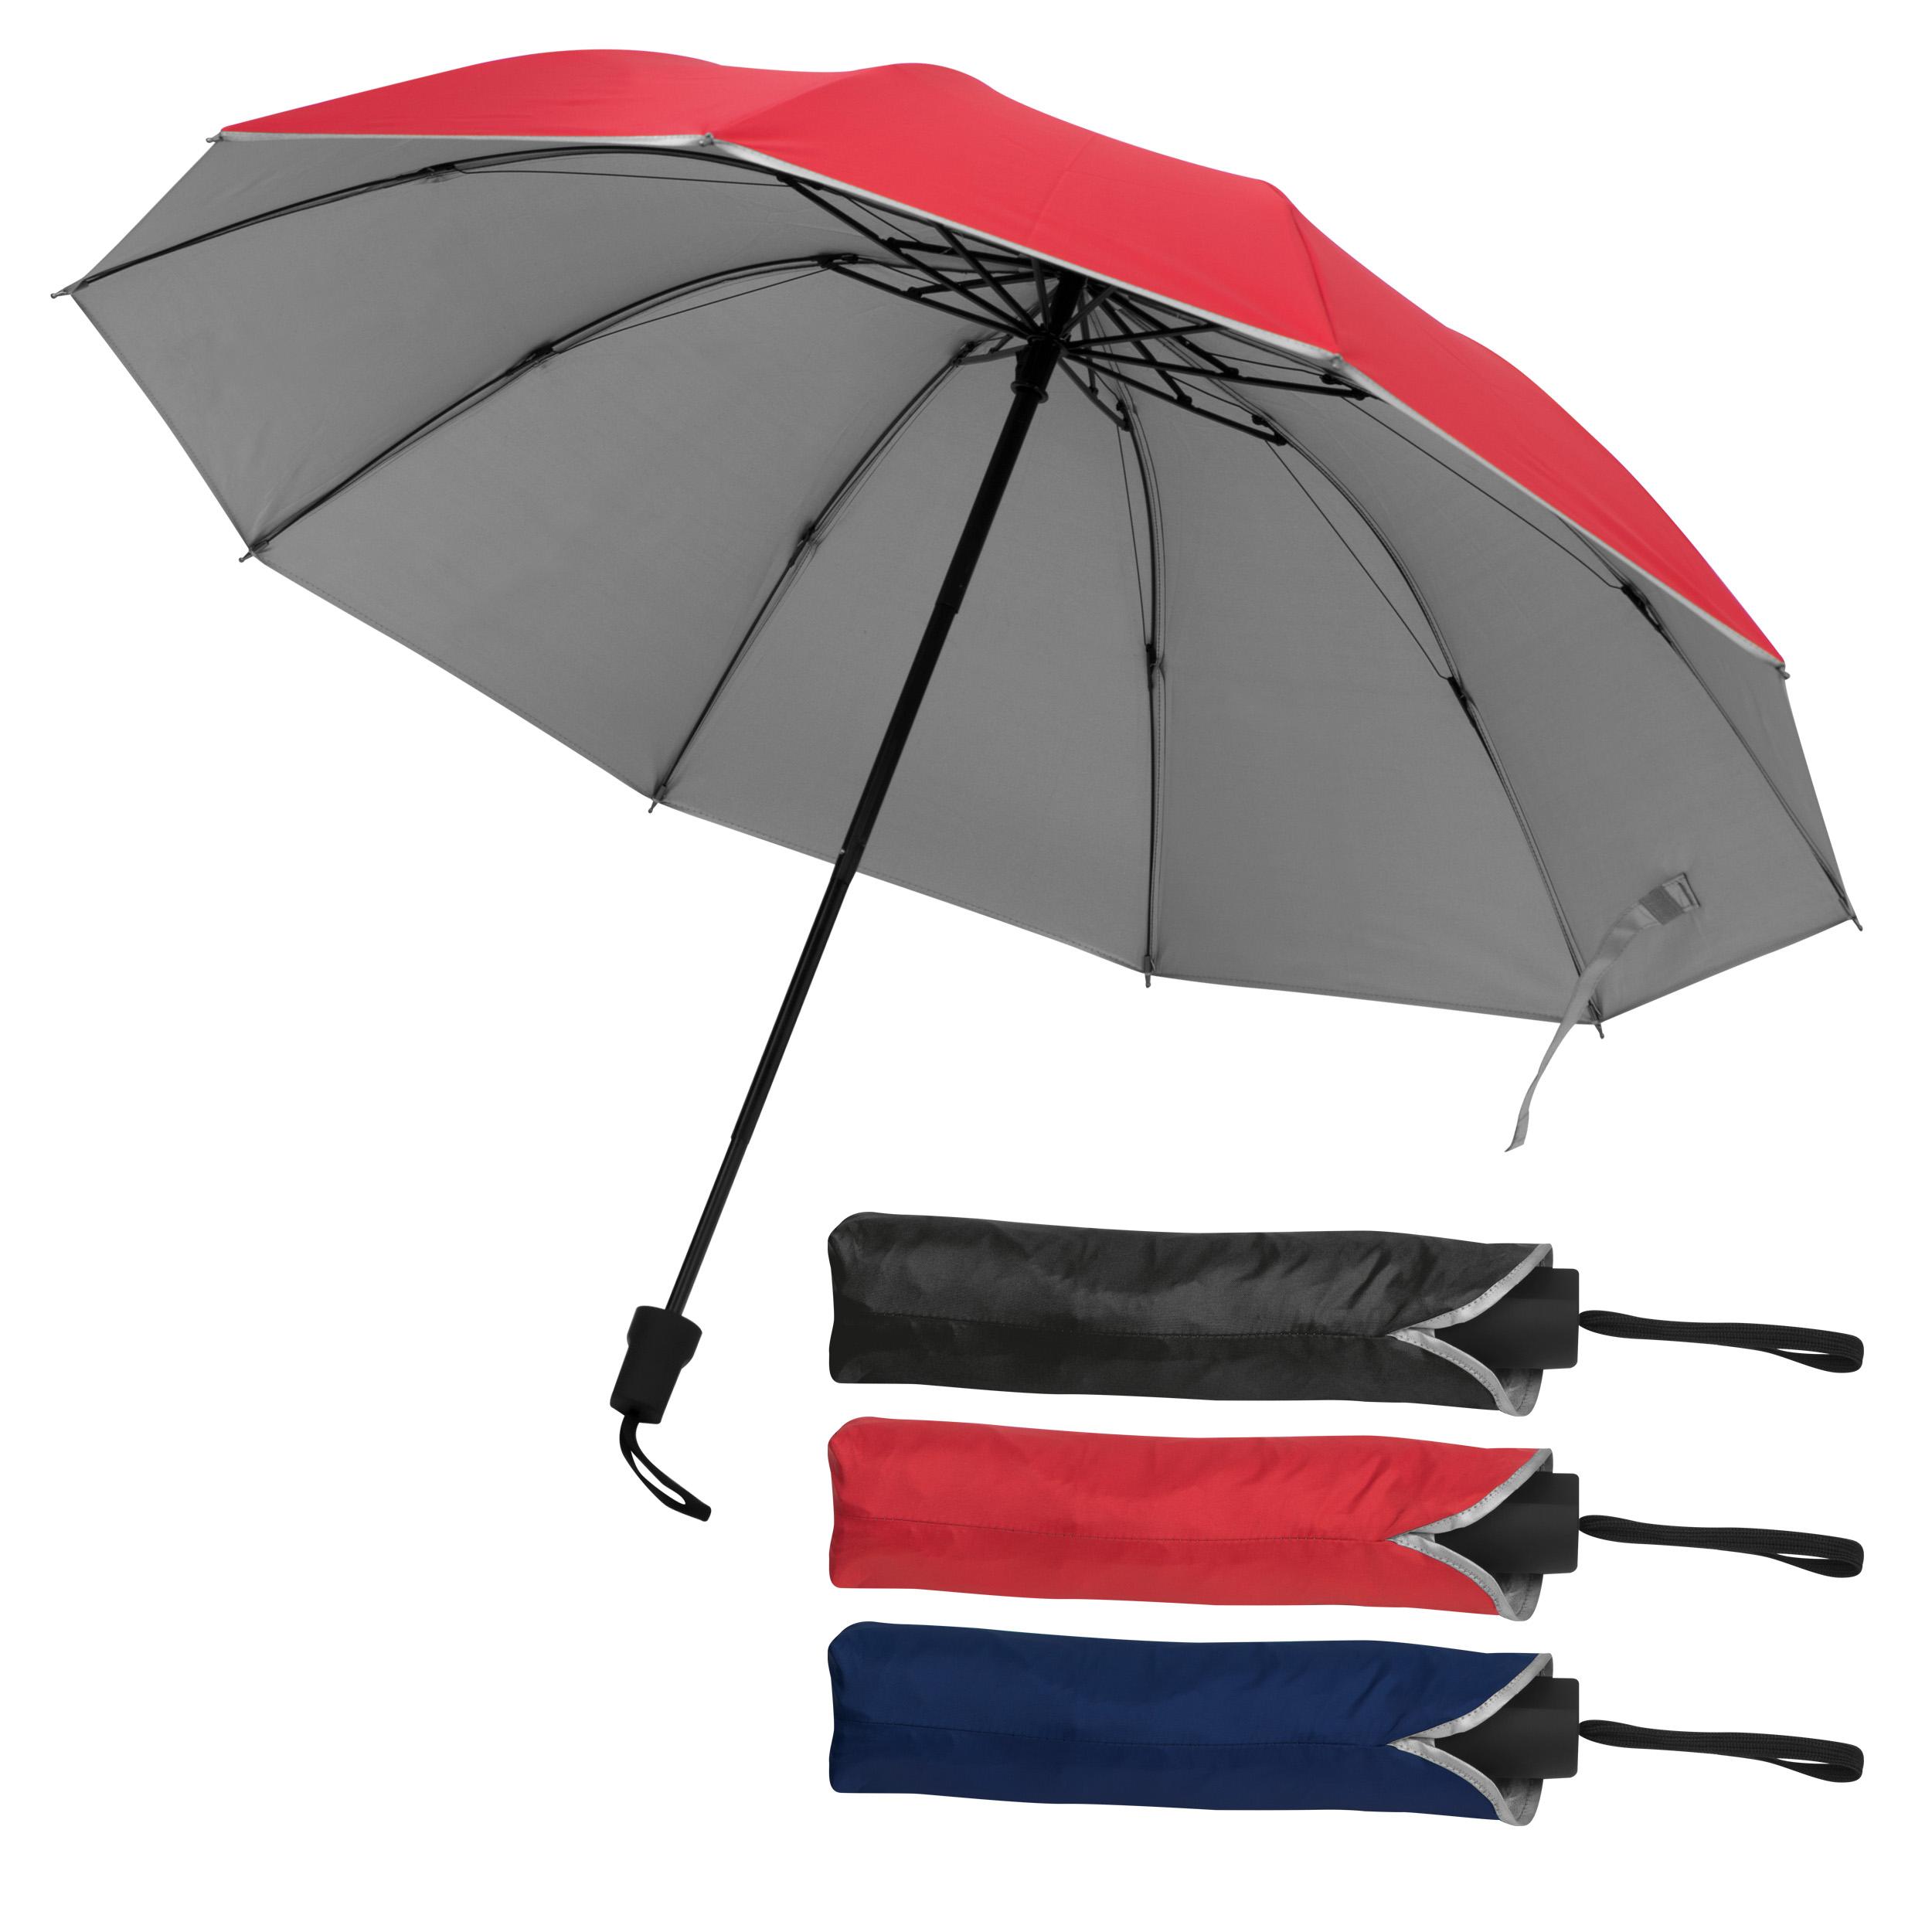 Umbrella with silver inside